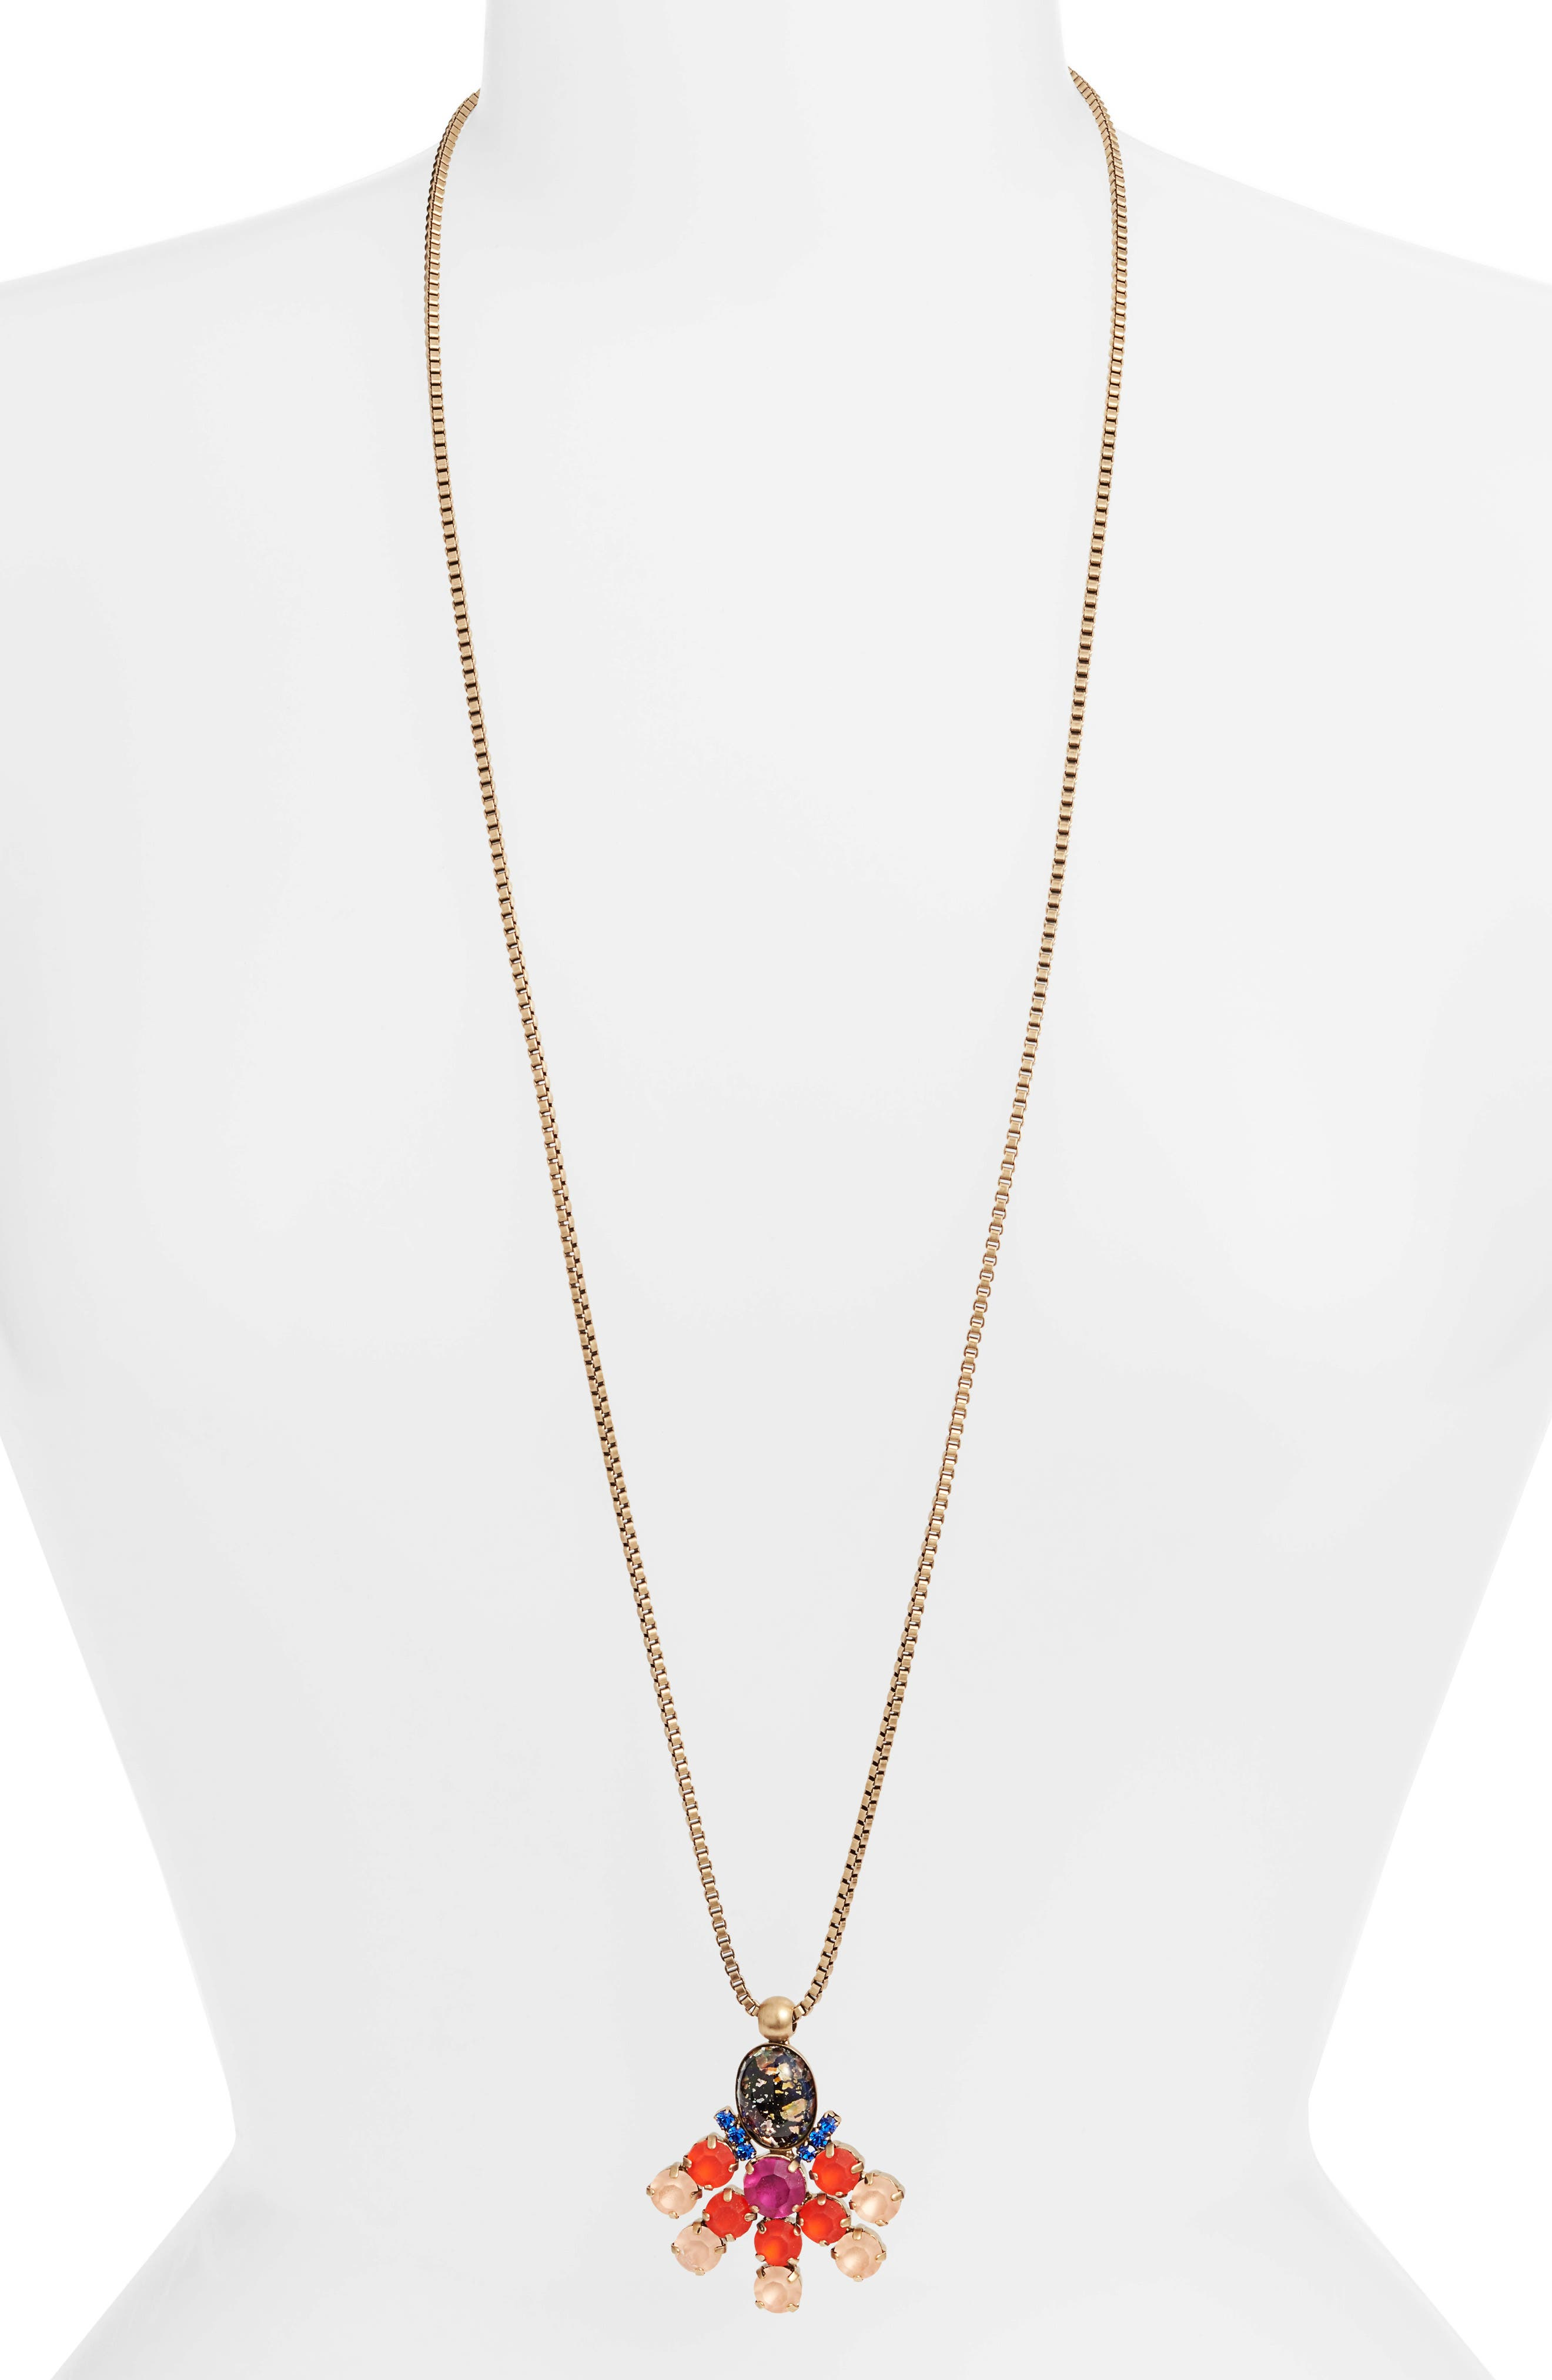 Lucy Long Pendant Necklace,                         Main,                         color, GOLD MULTI